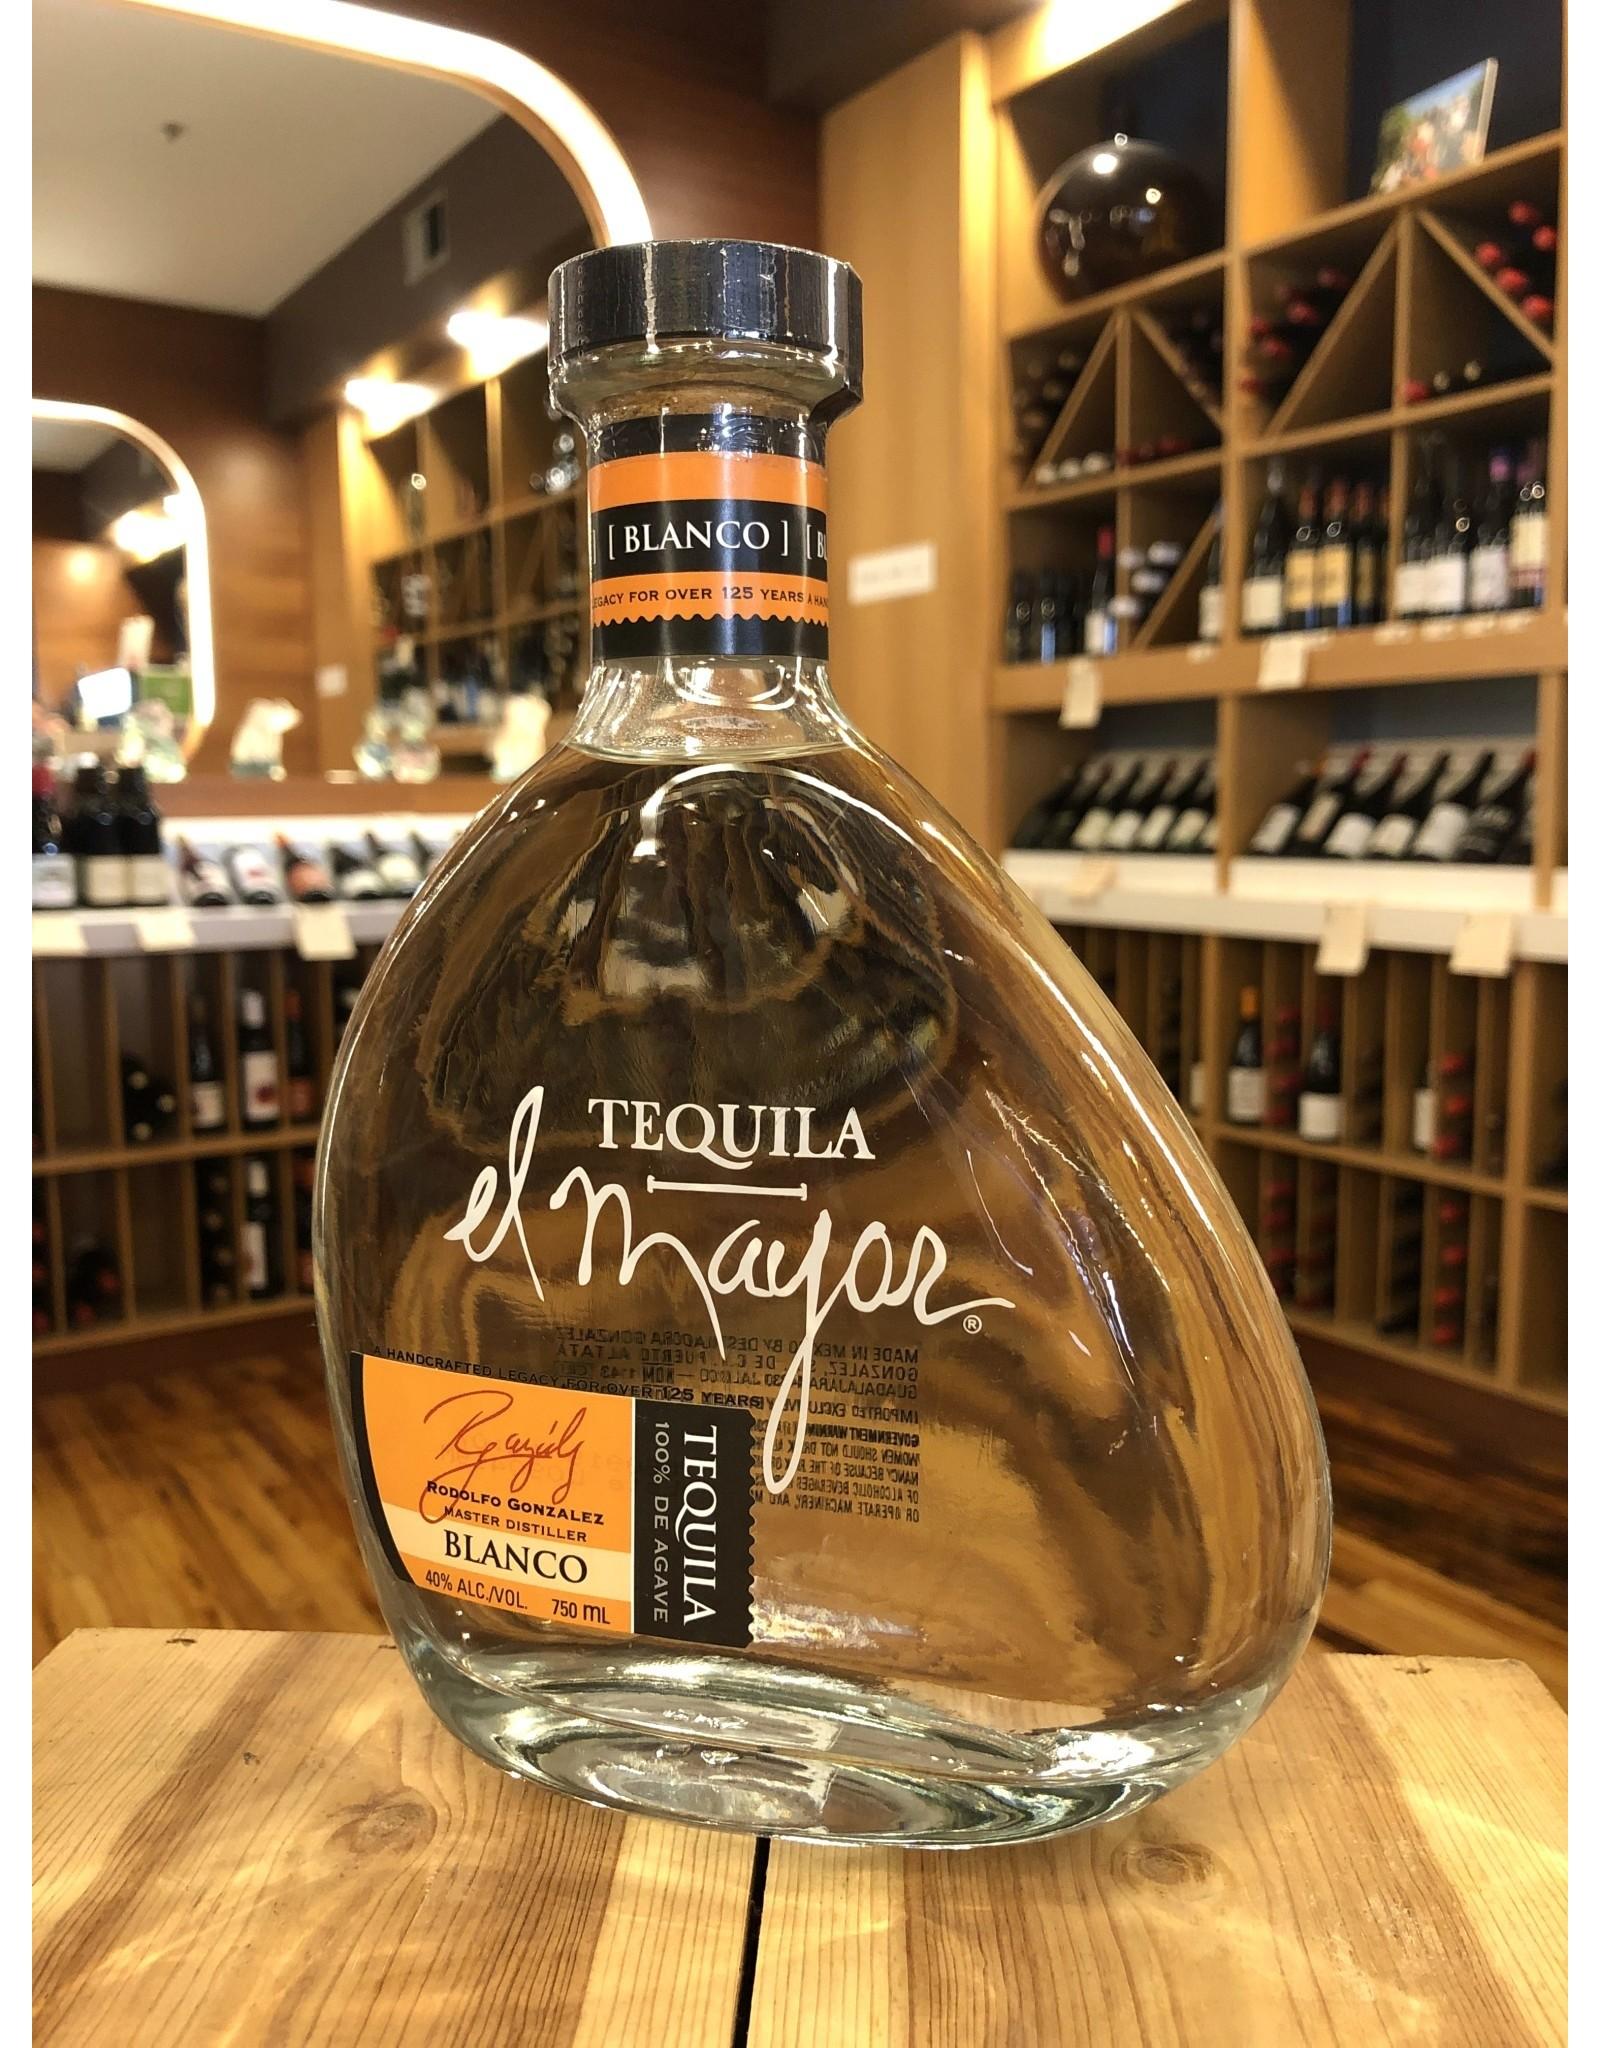 El Mayor Blanco Tequila - 750 ML